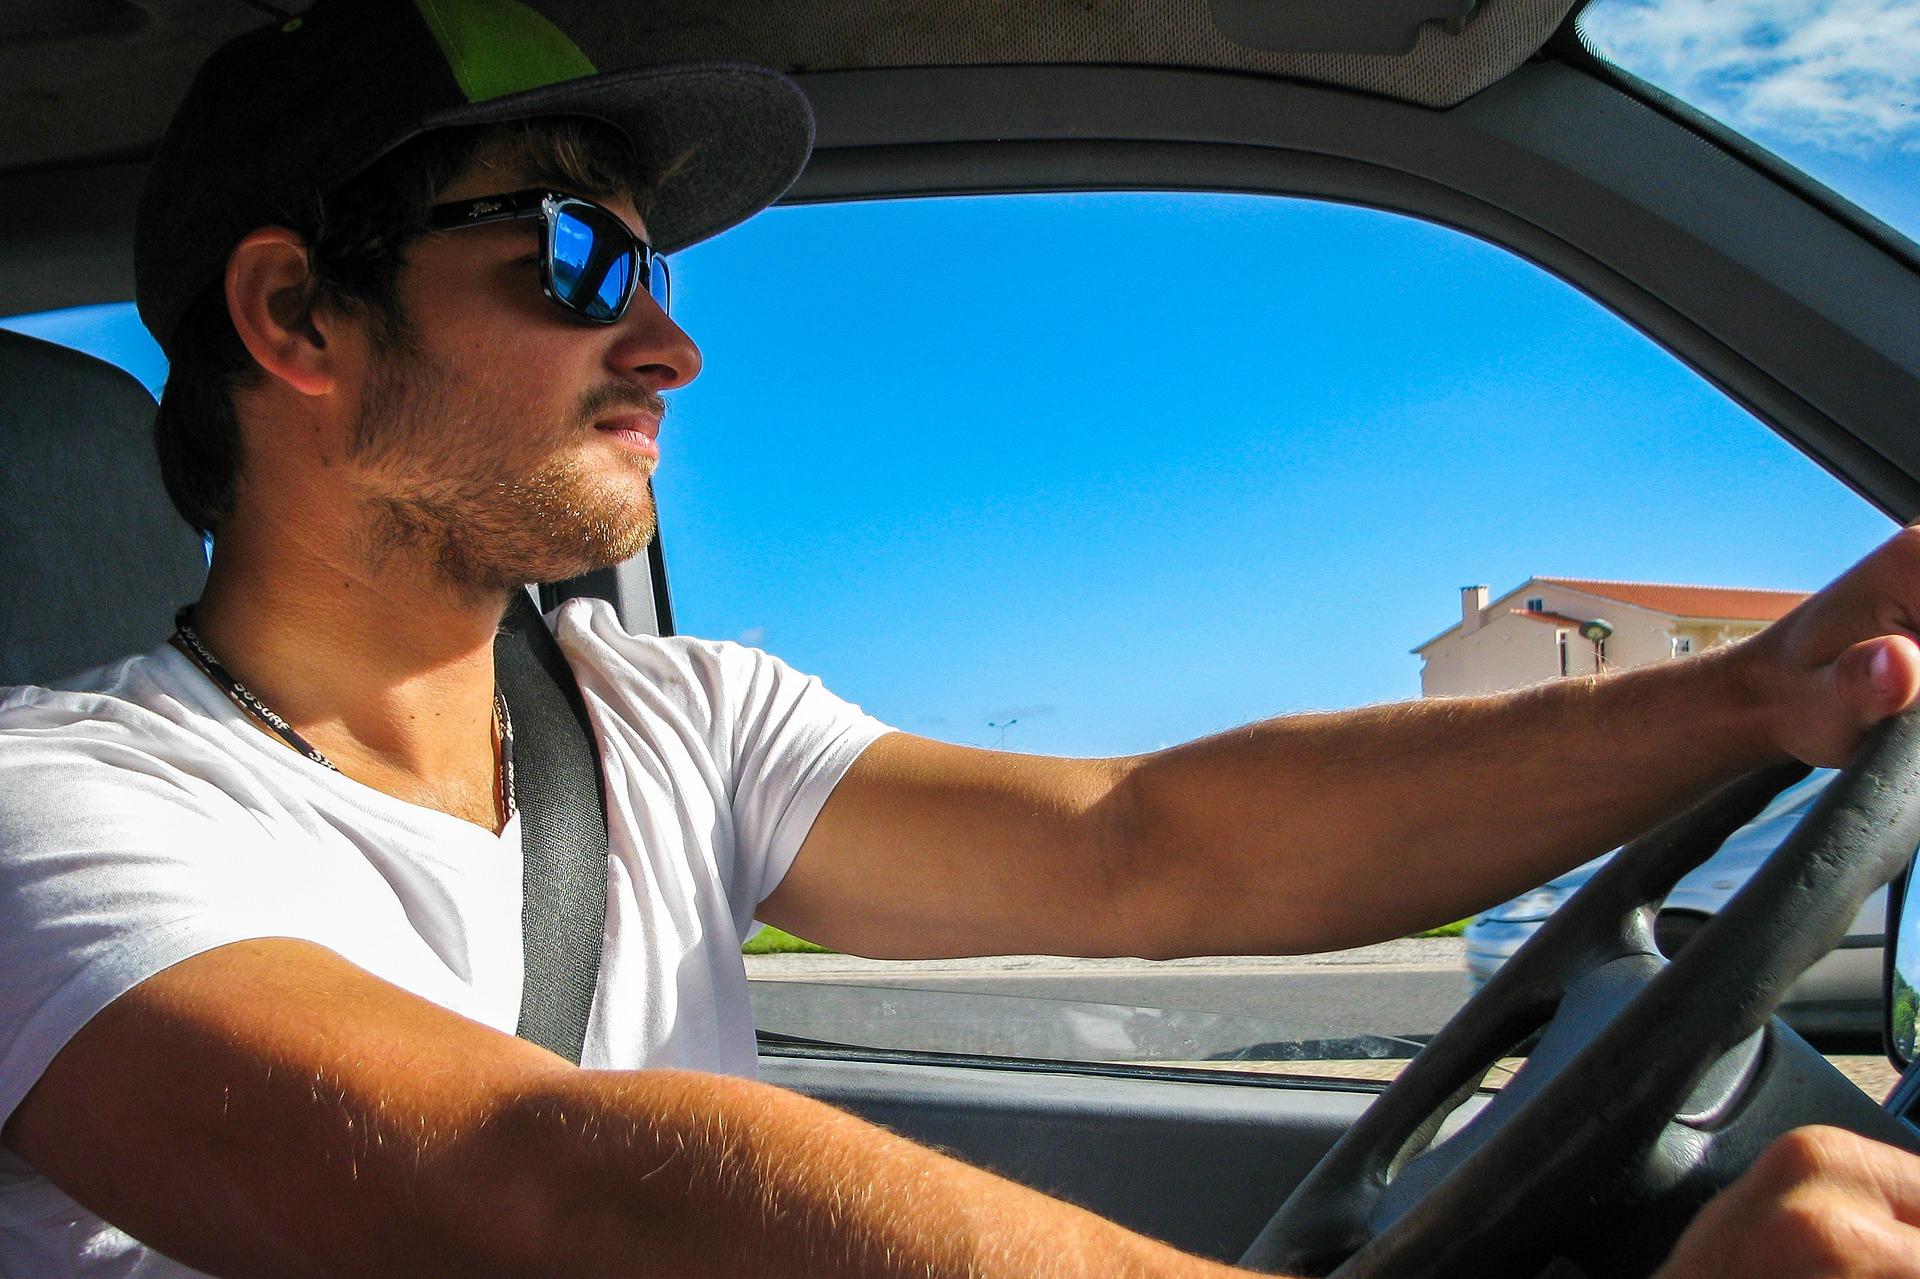 Tipps gegen Hitze im Auto